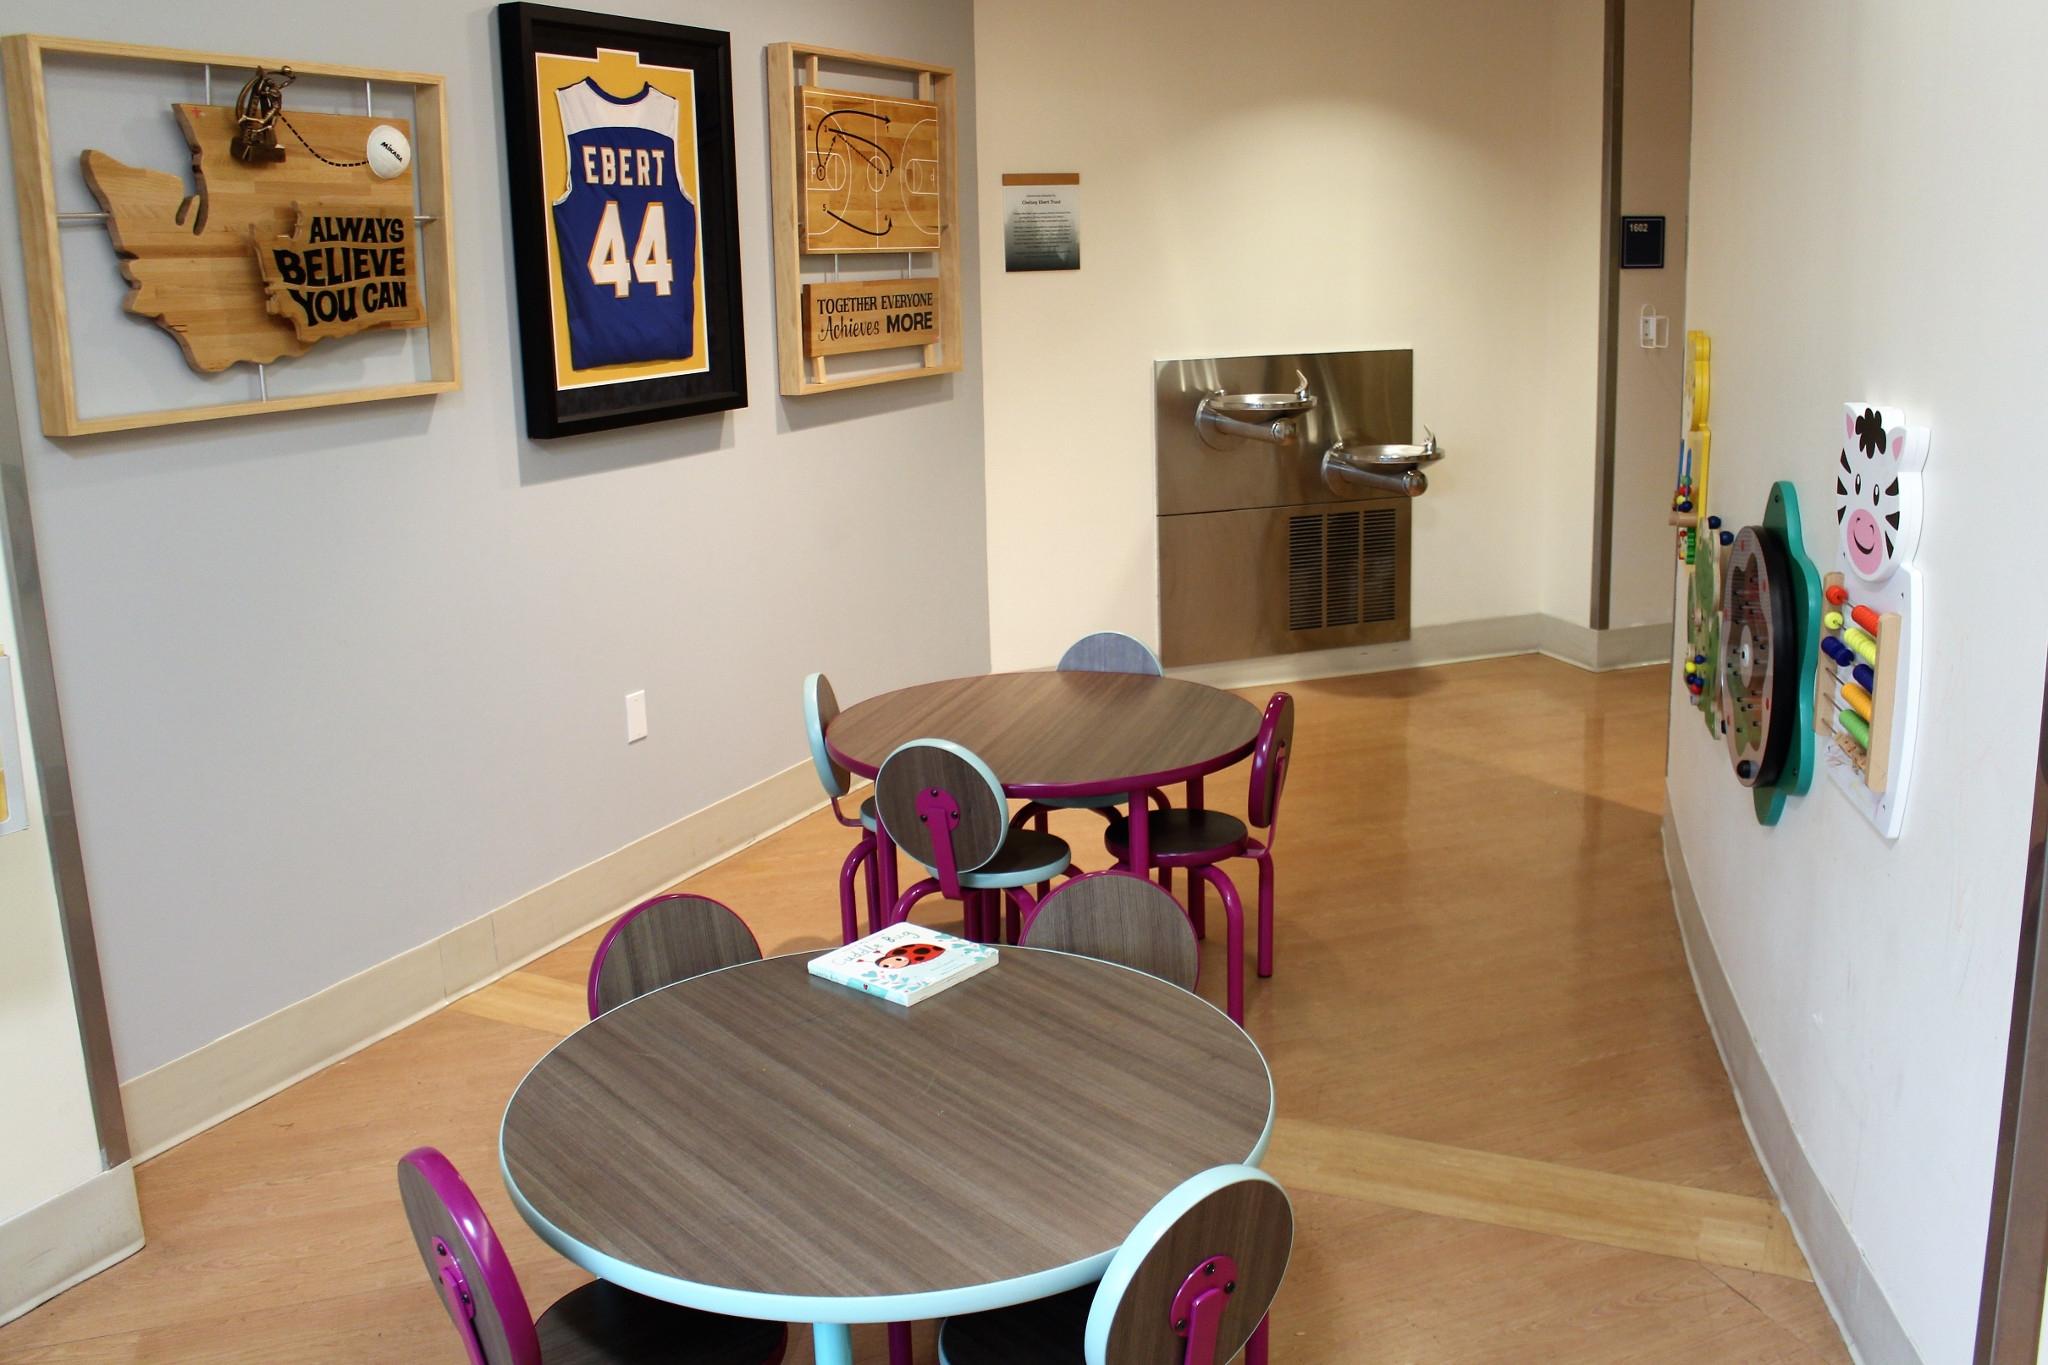 Entertainment zone at PeaceHealth St Joseph Medical Center ER waiting area (2019). Photo courtesy of PeaceHealth